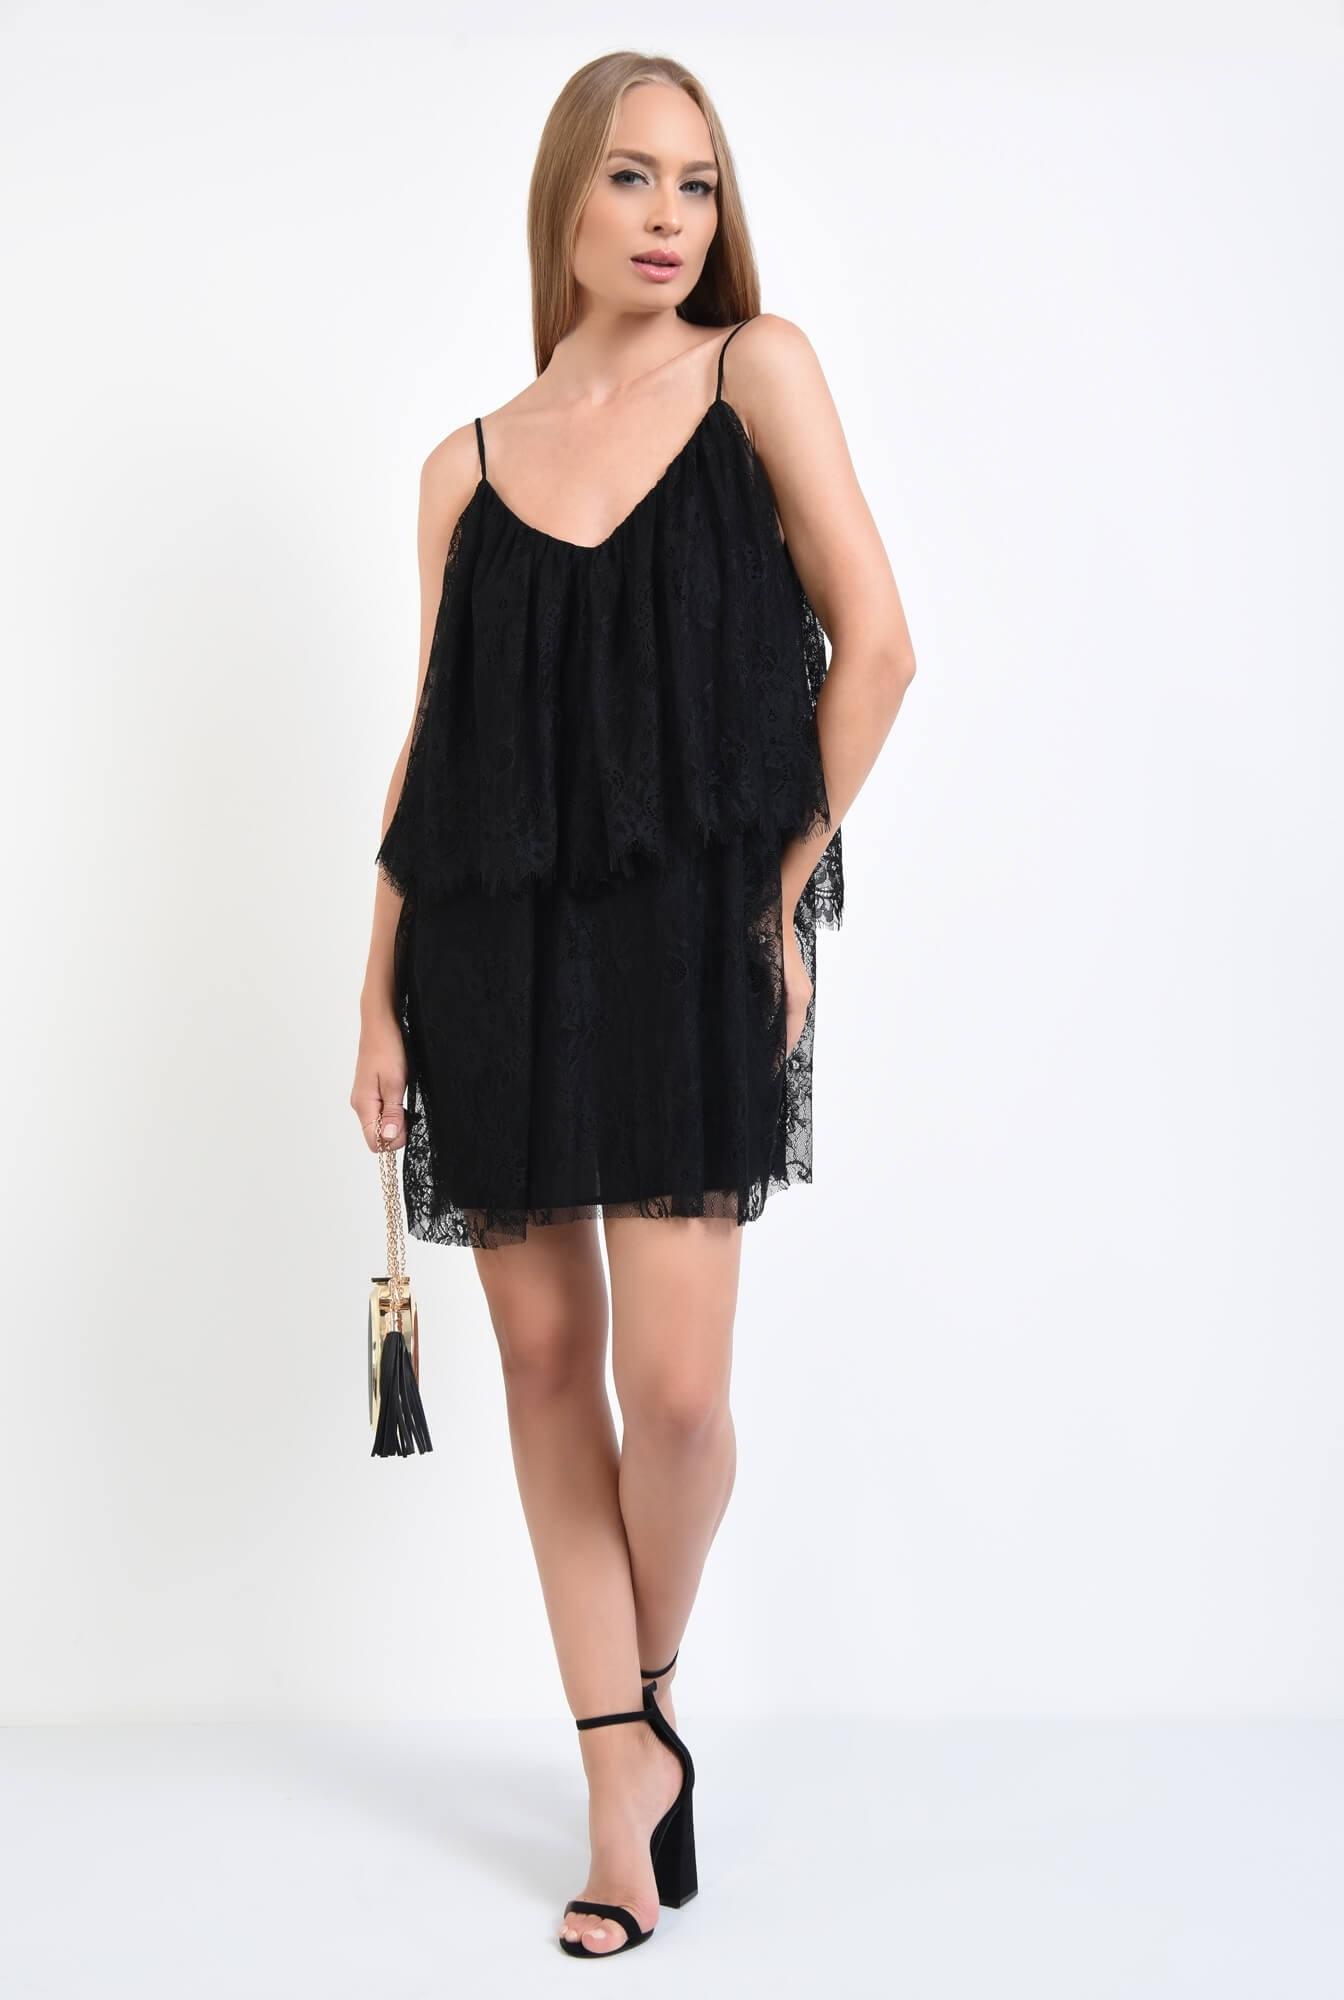 3 - rochie de seara, scurta, din dantela, negru, bretele subtiri